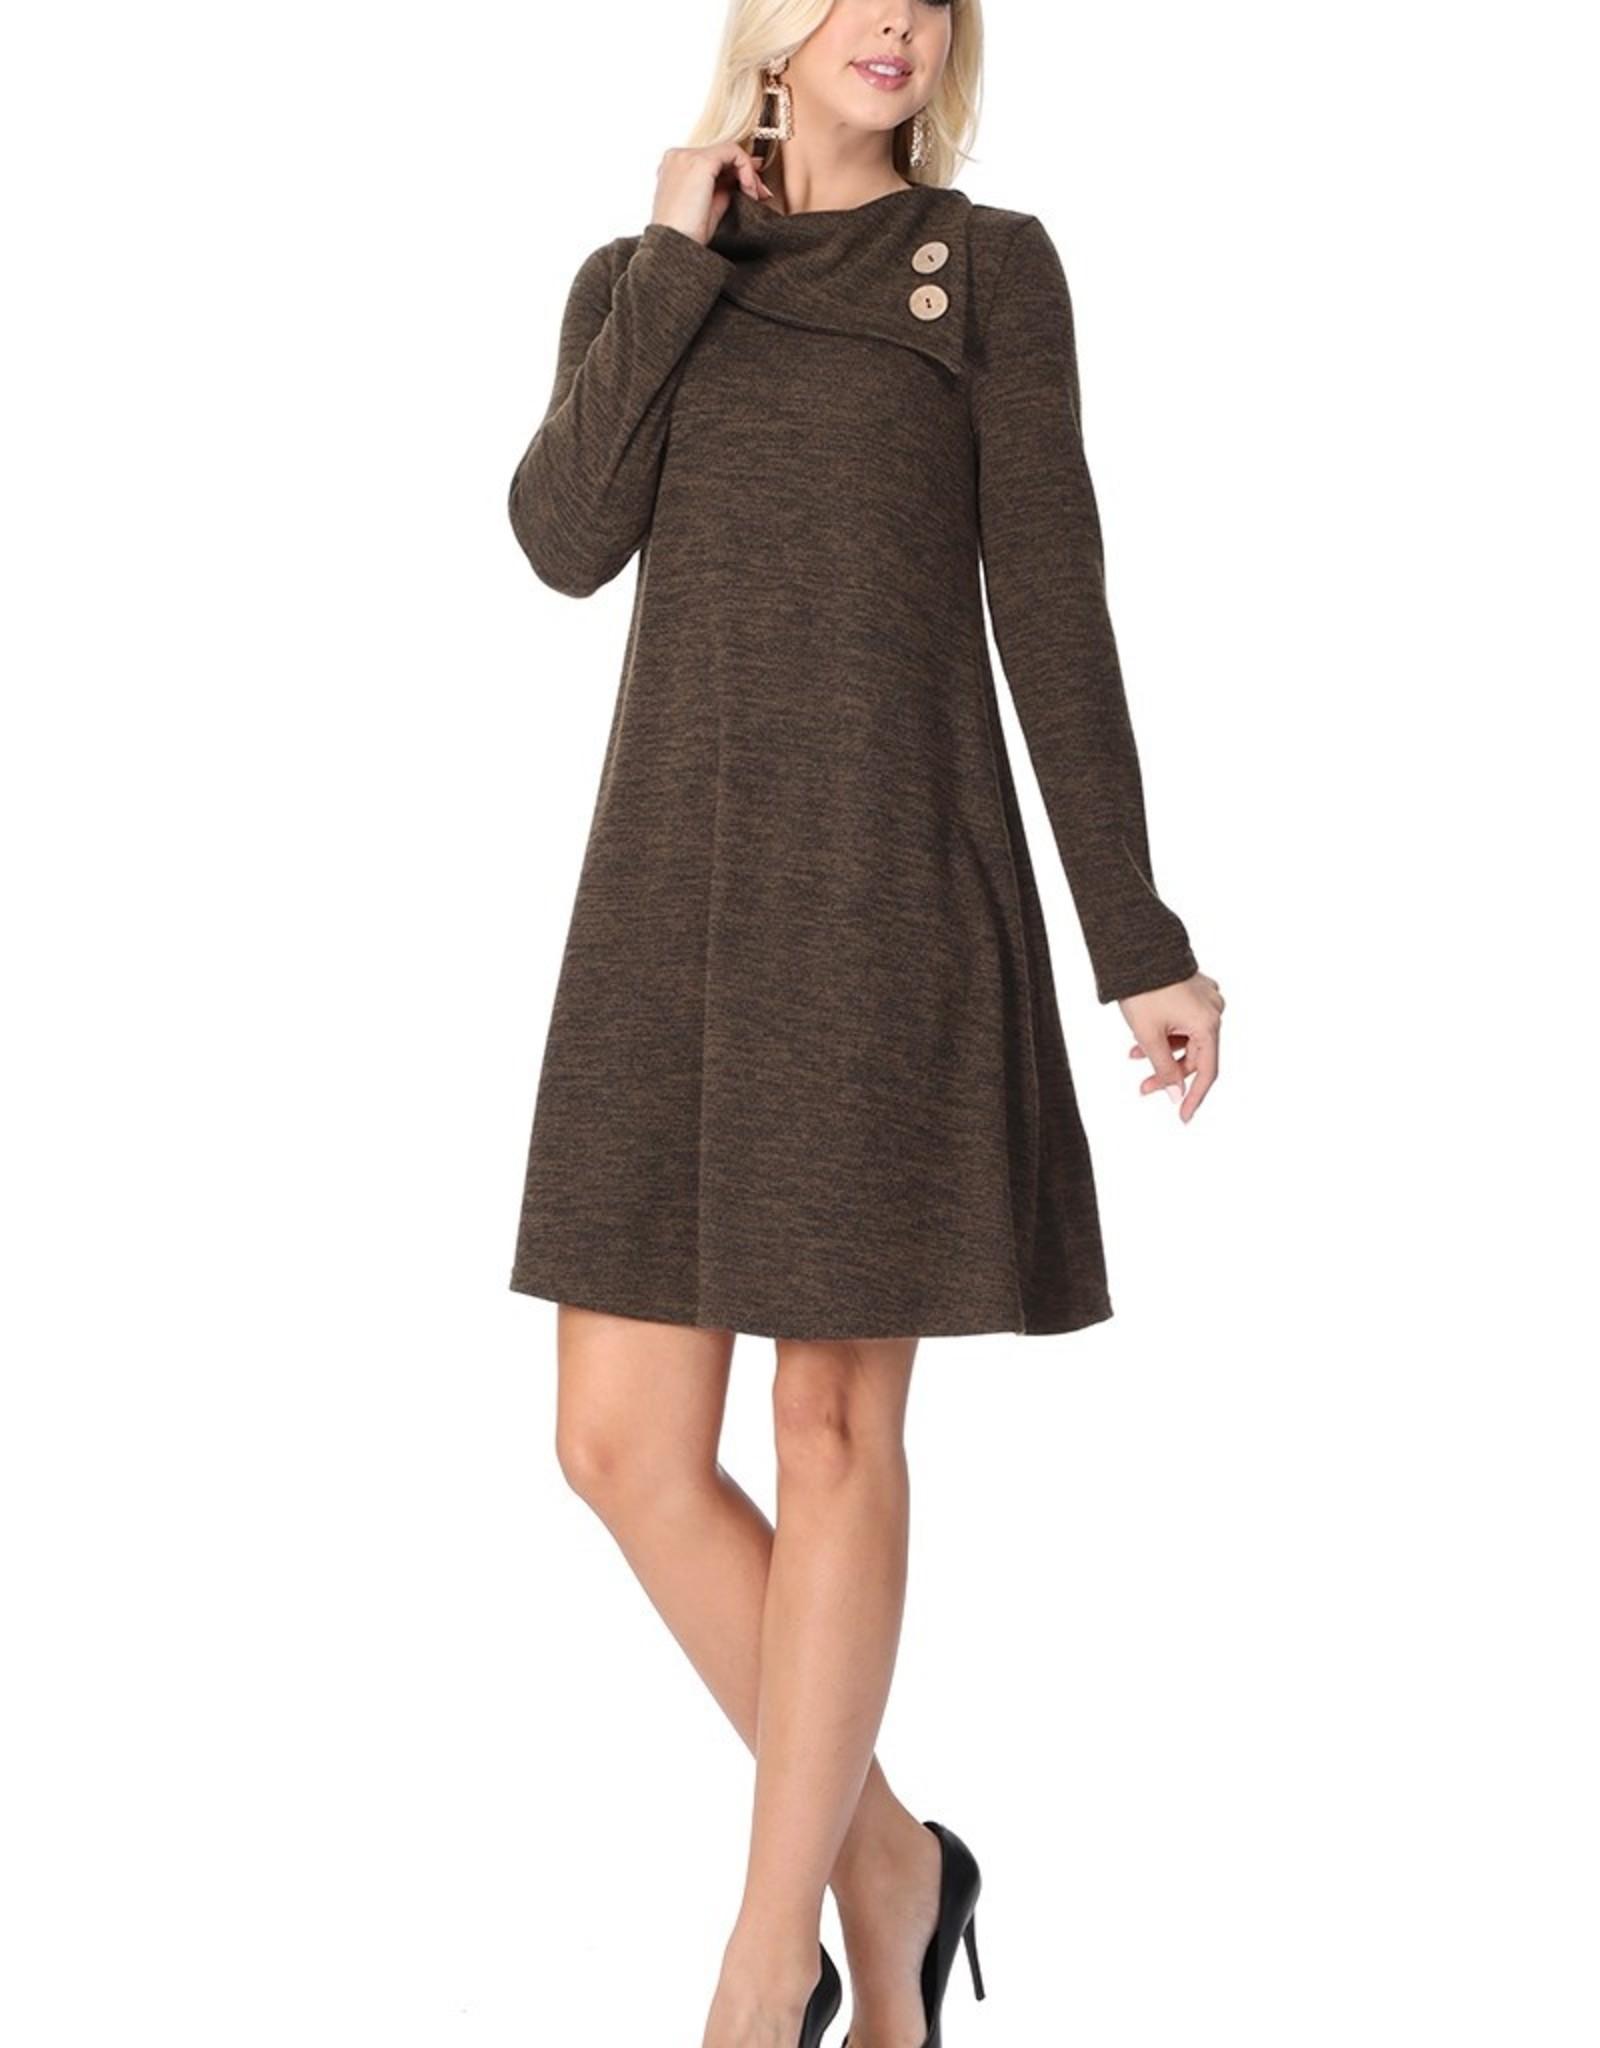 Alicia Cowl Neck Knit Dress